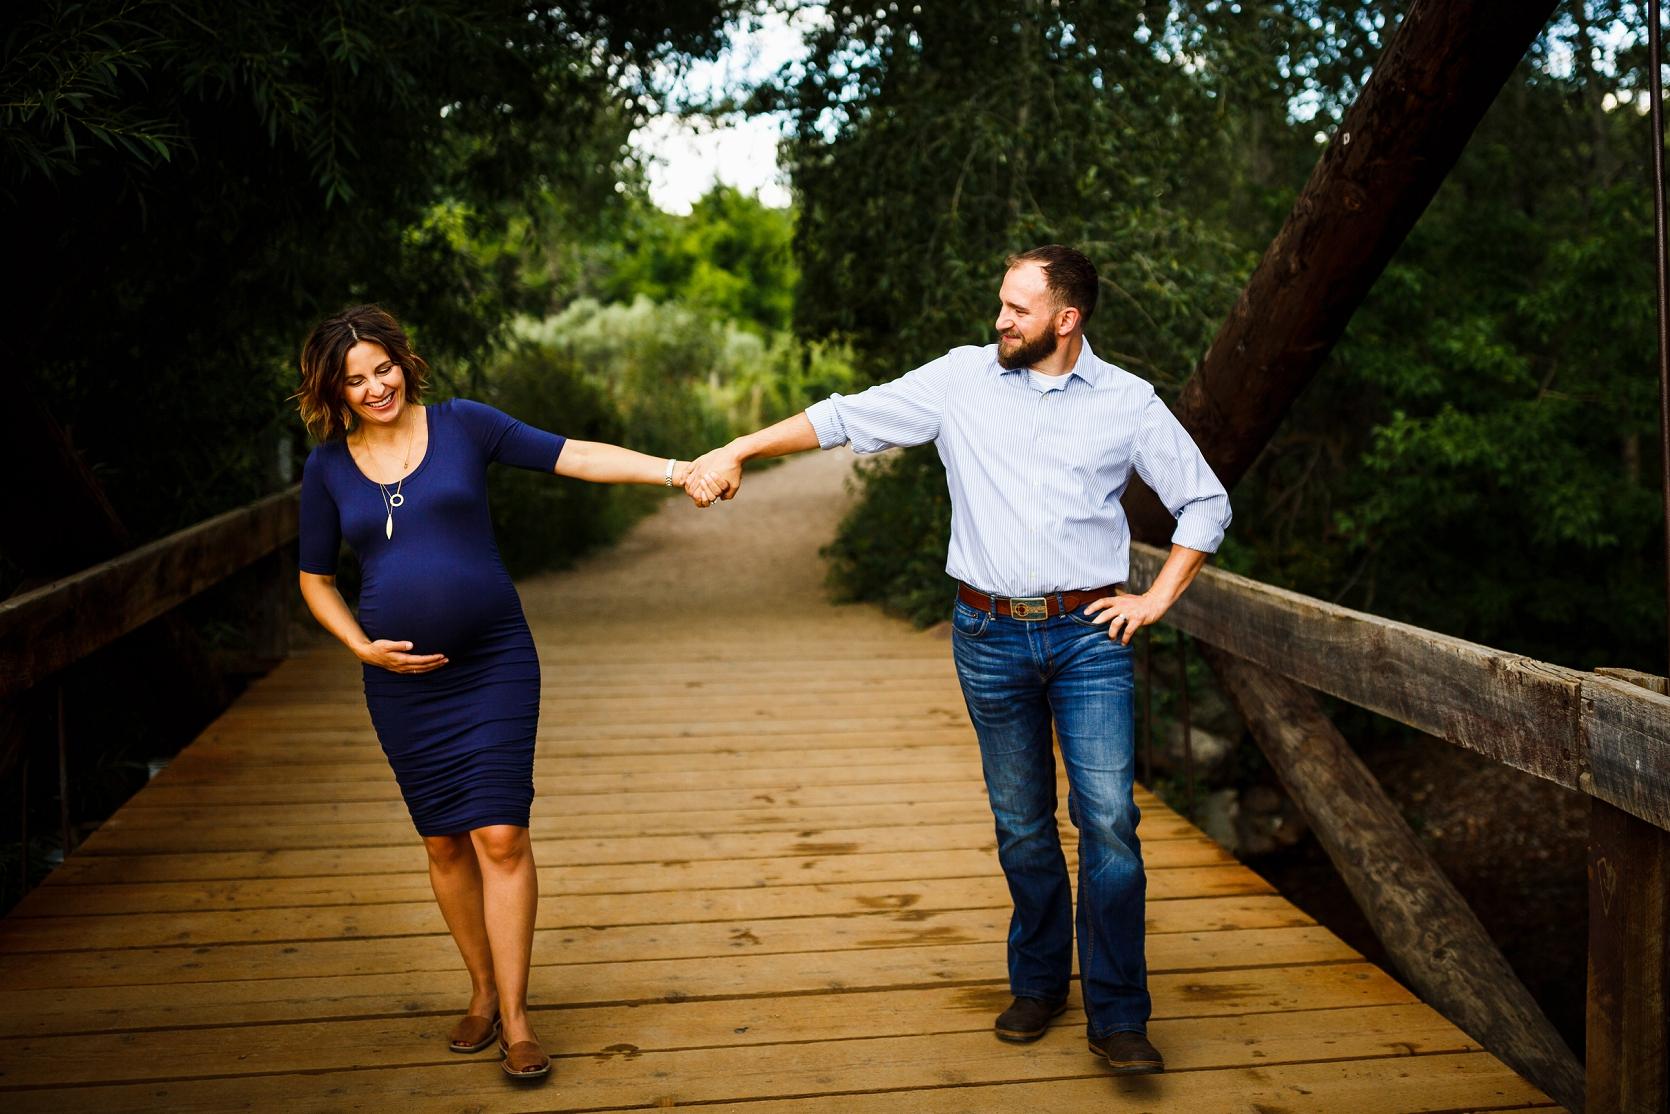 South_Mesa_Trailhead_Maternity_Session_0013